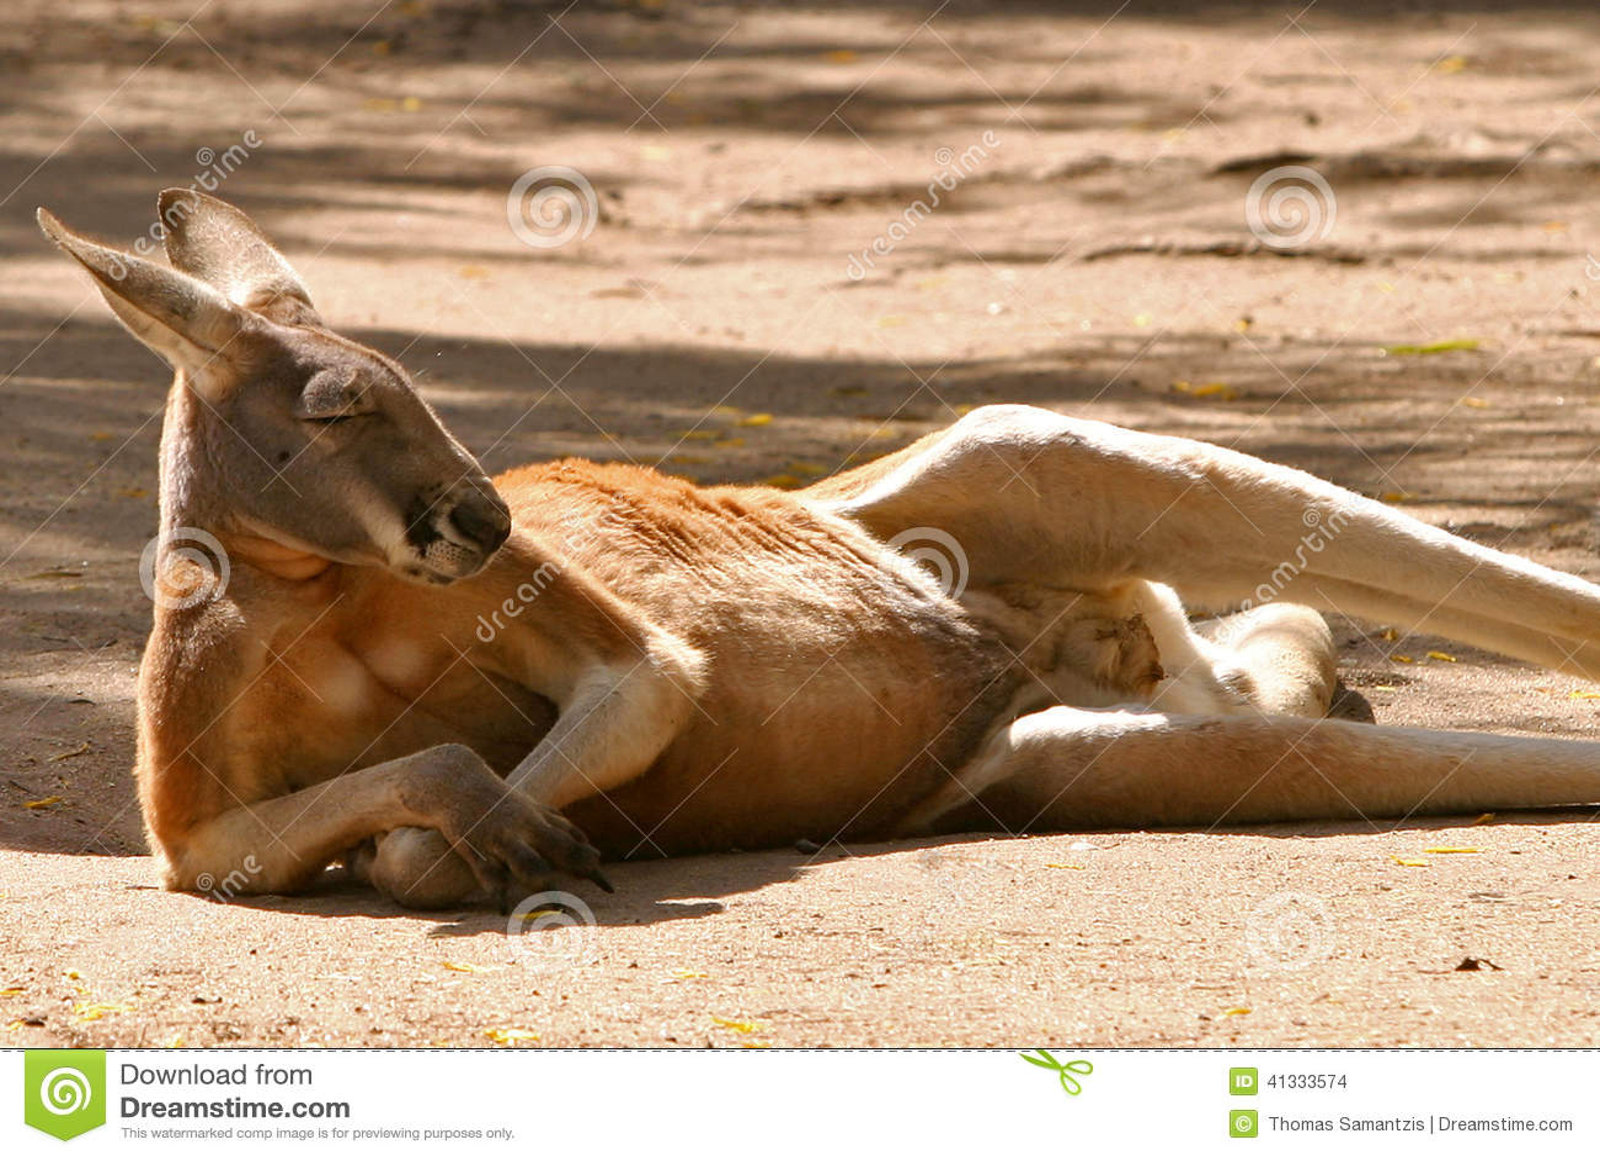 Red kangaroo resting stock photo. Image of posture ...